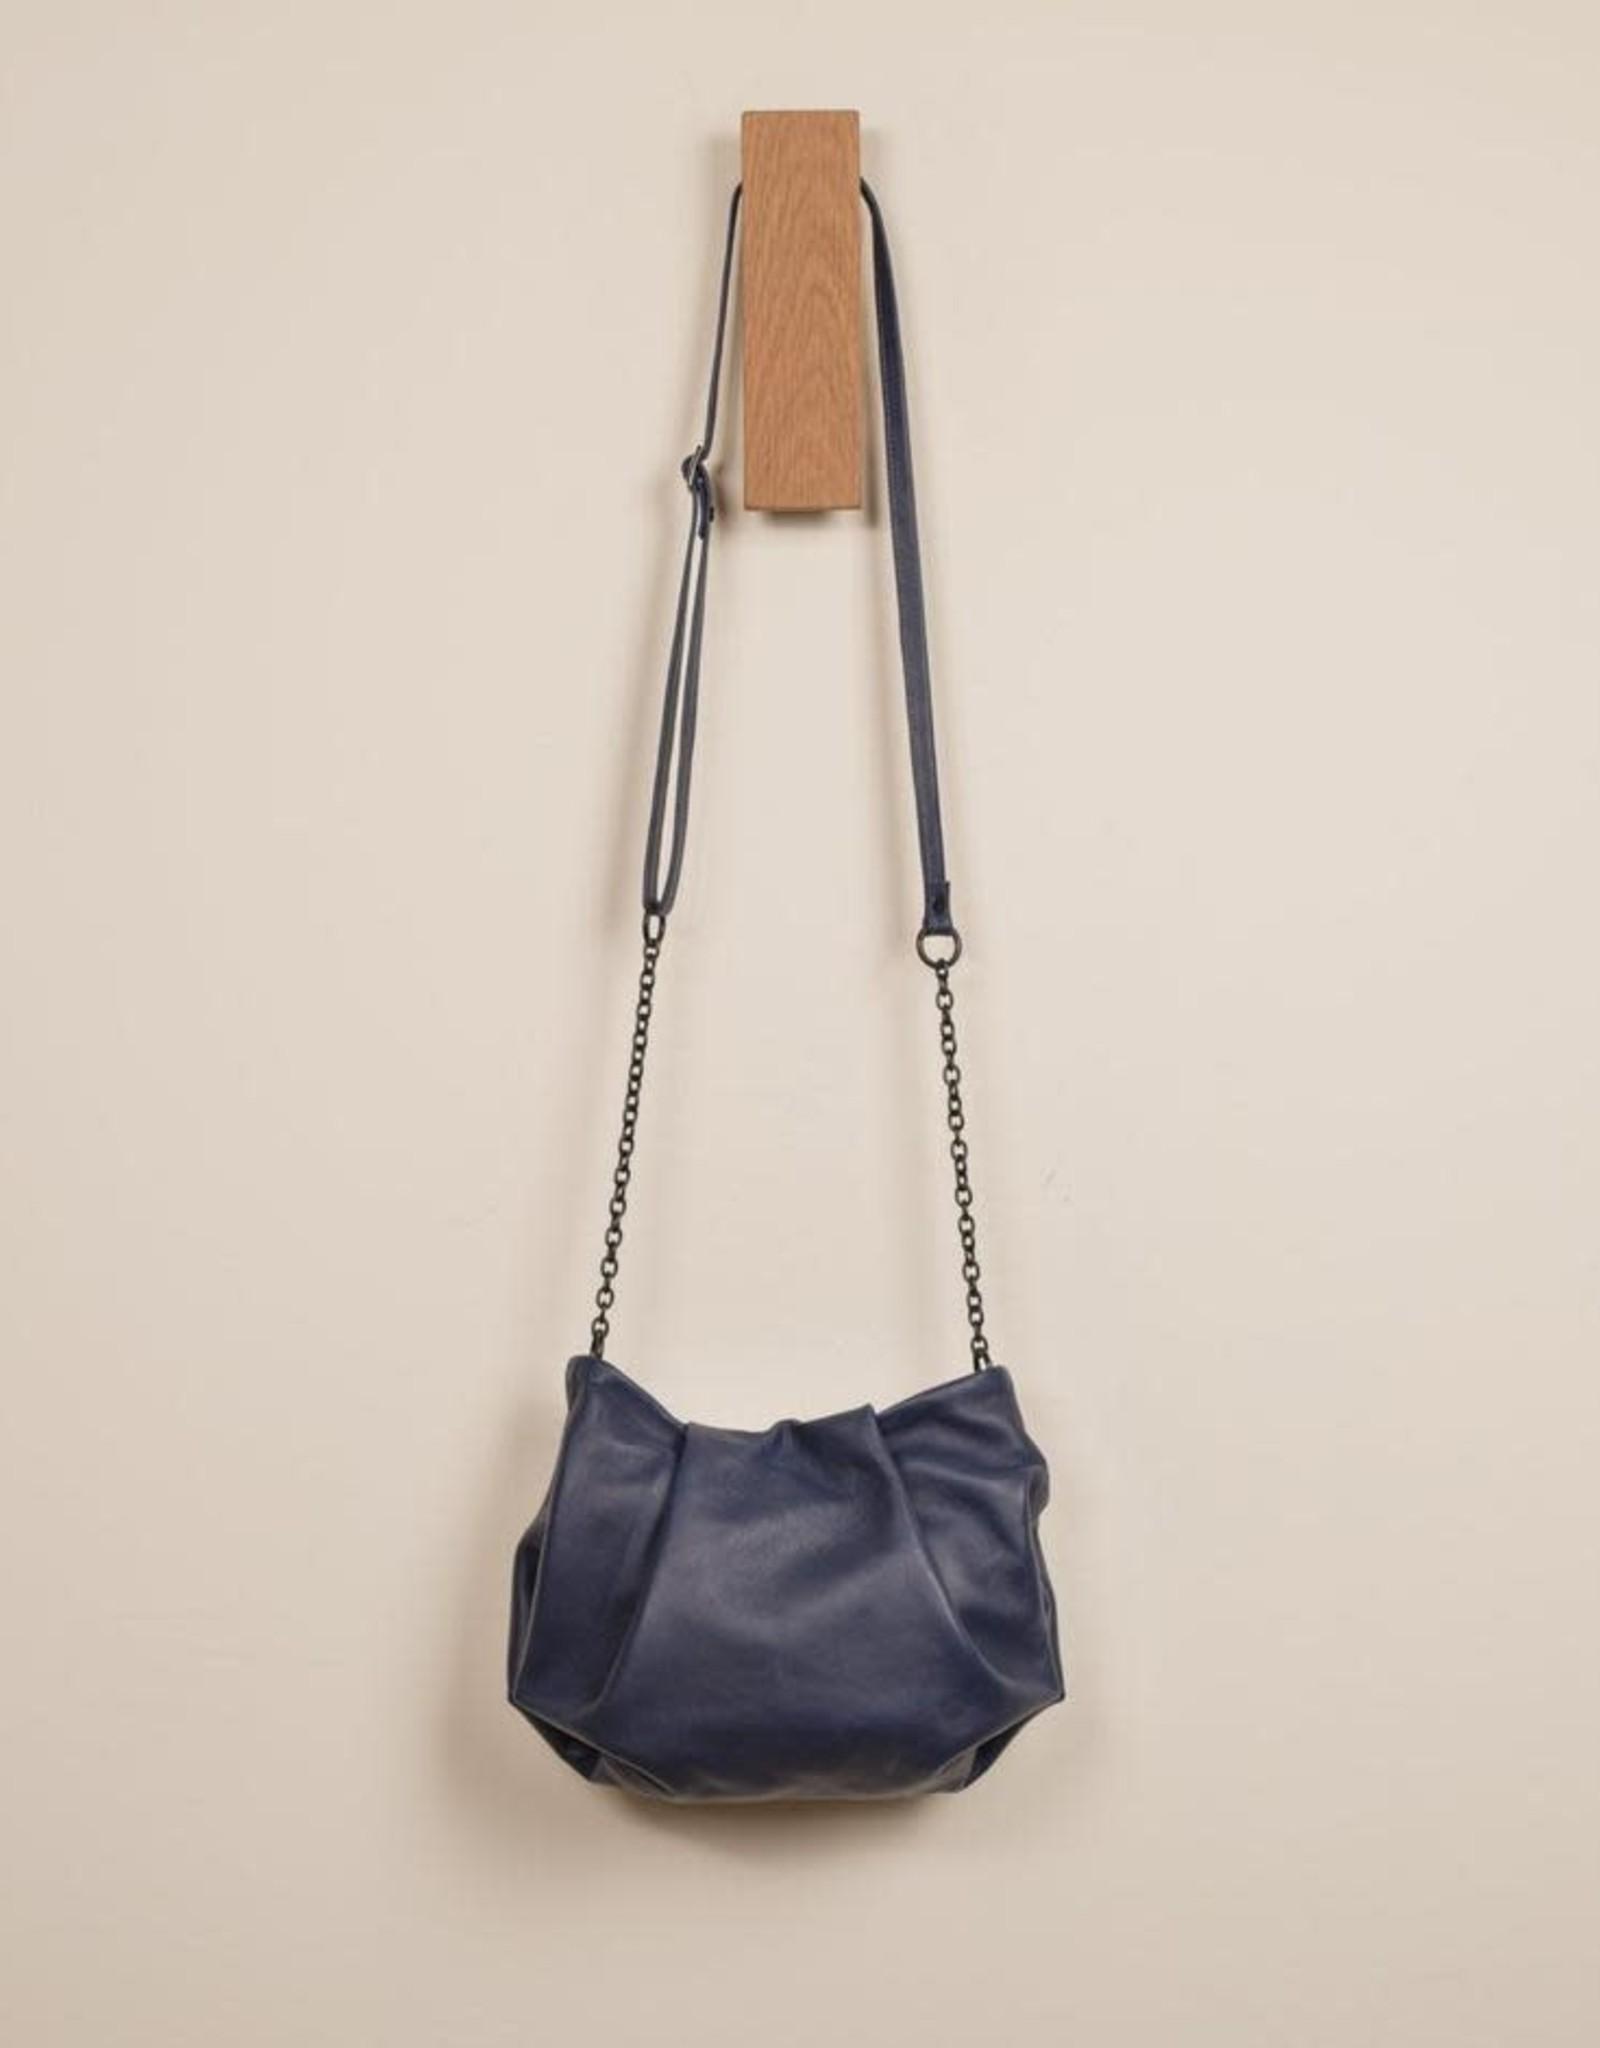 Daniella Lehavi Bali Mini Bag